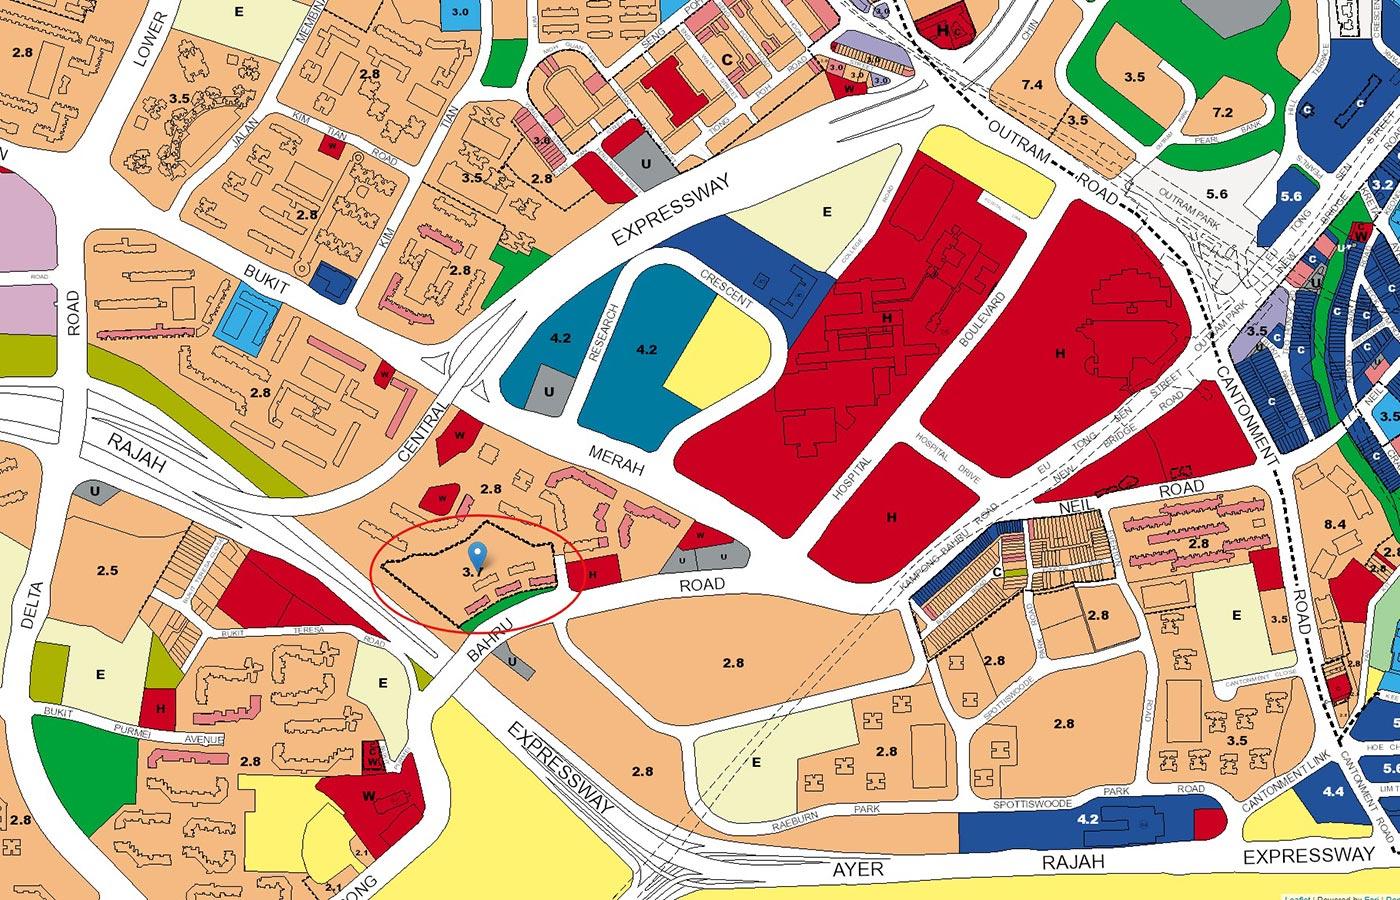 Avenue-South-Residence-Condo-URA-Master-Plan-Map